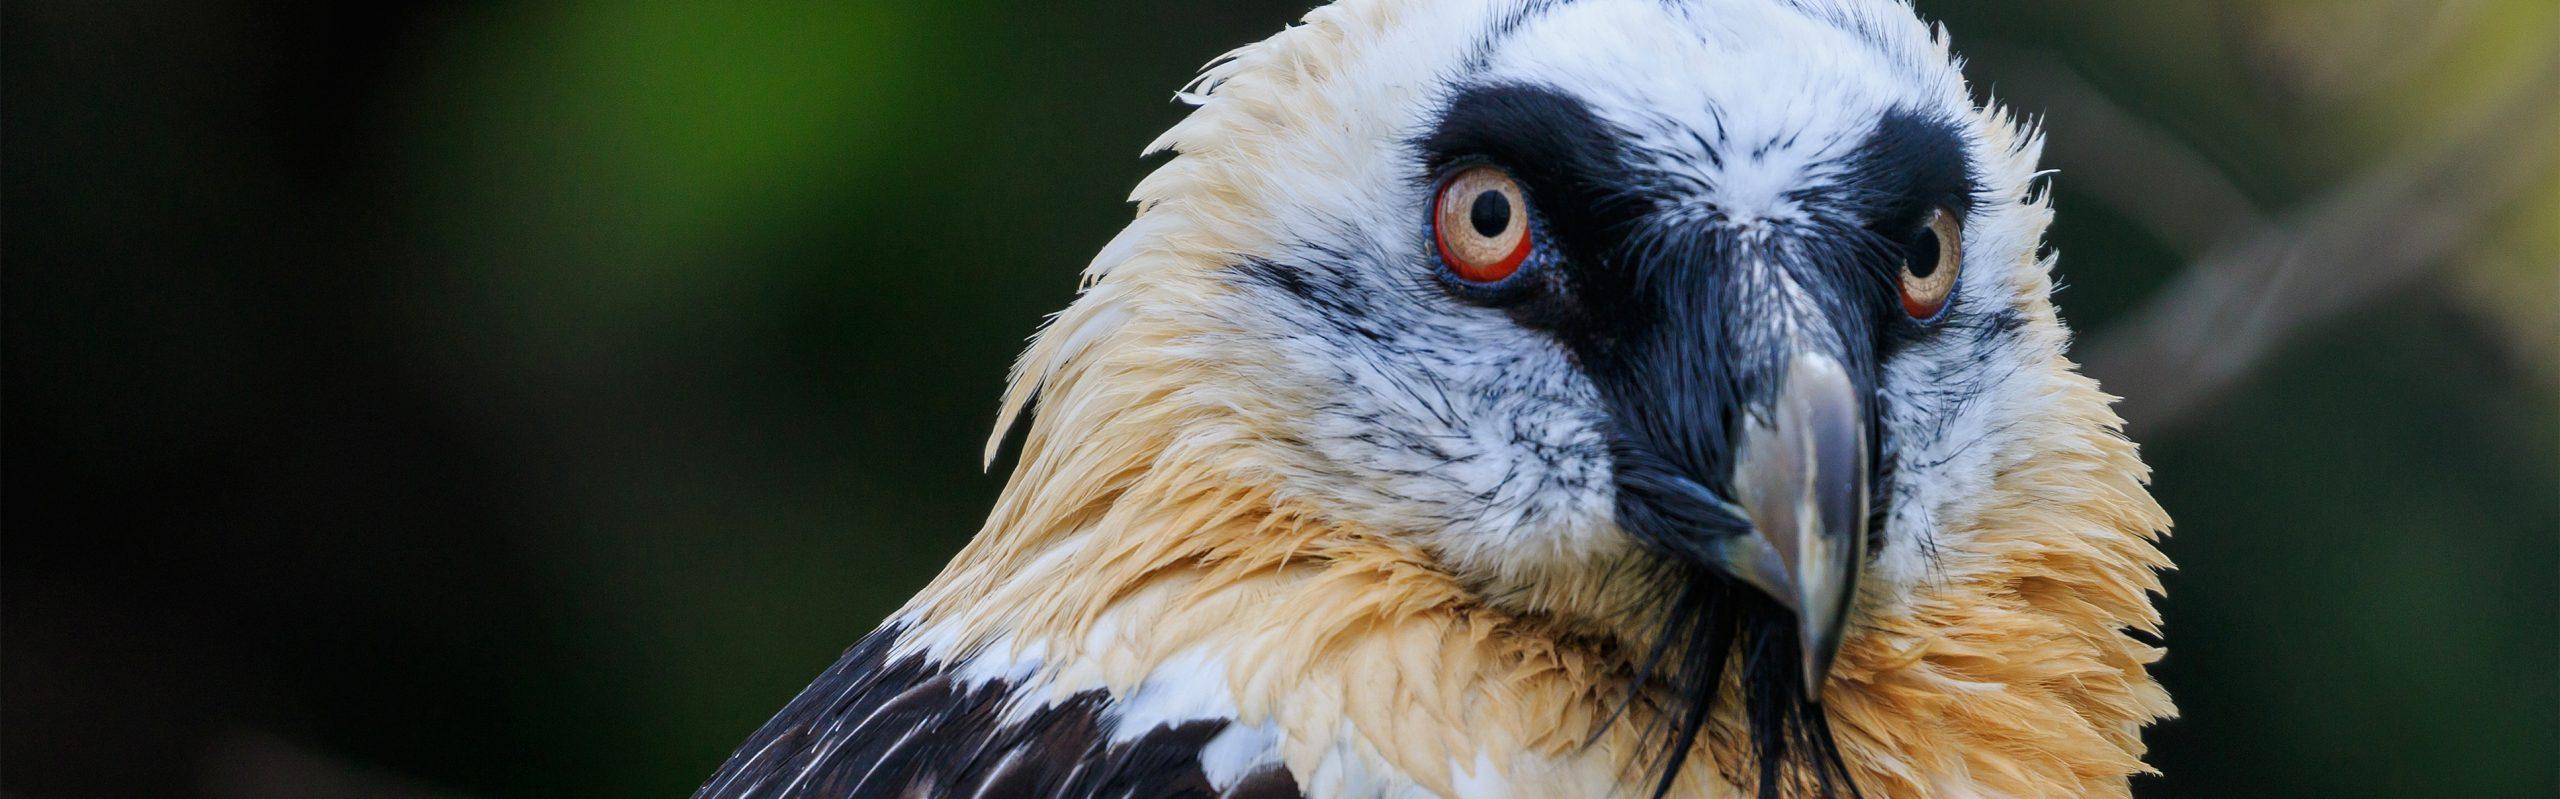 https://faunafocus.com/home/may-2018-bearded-vulture/#jp-carousel-7880